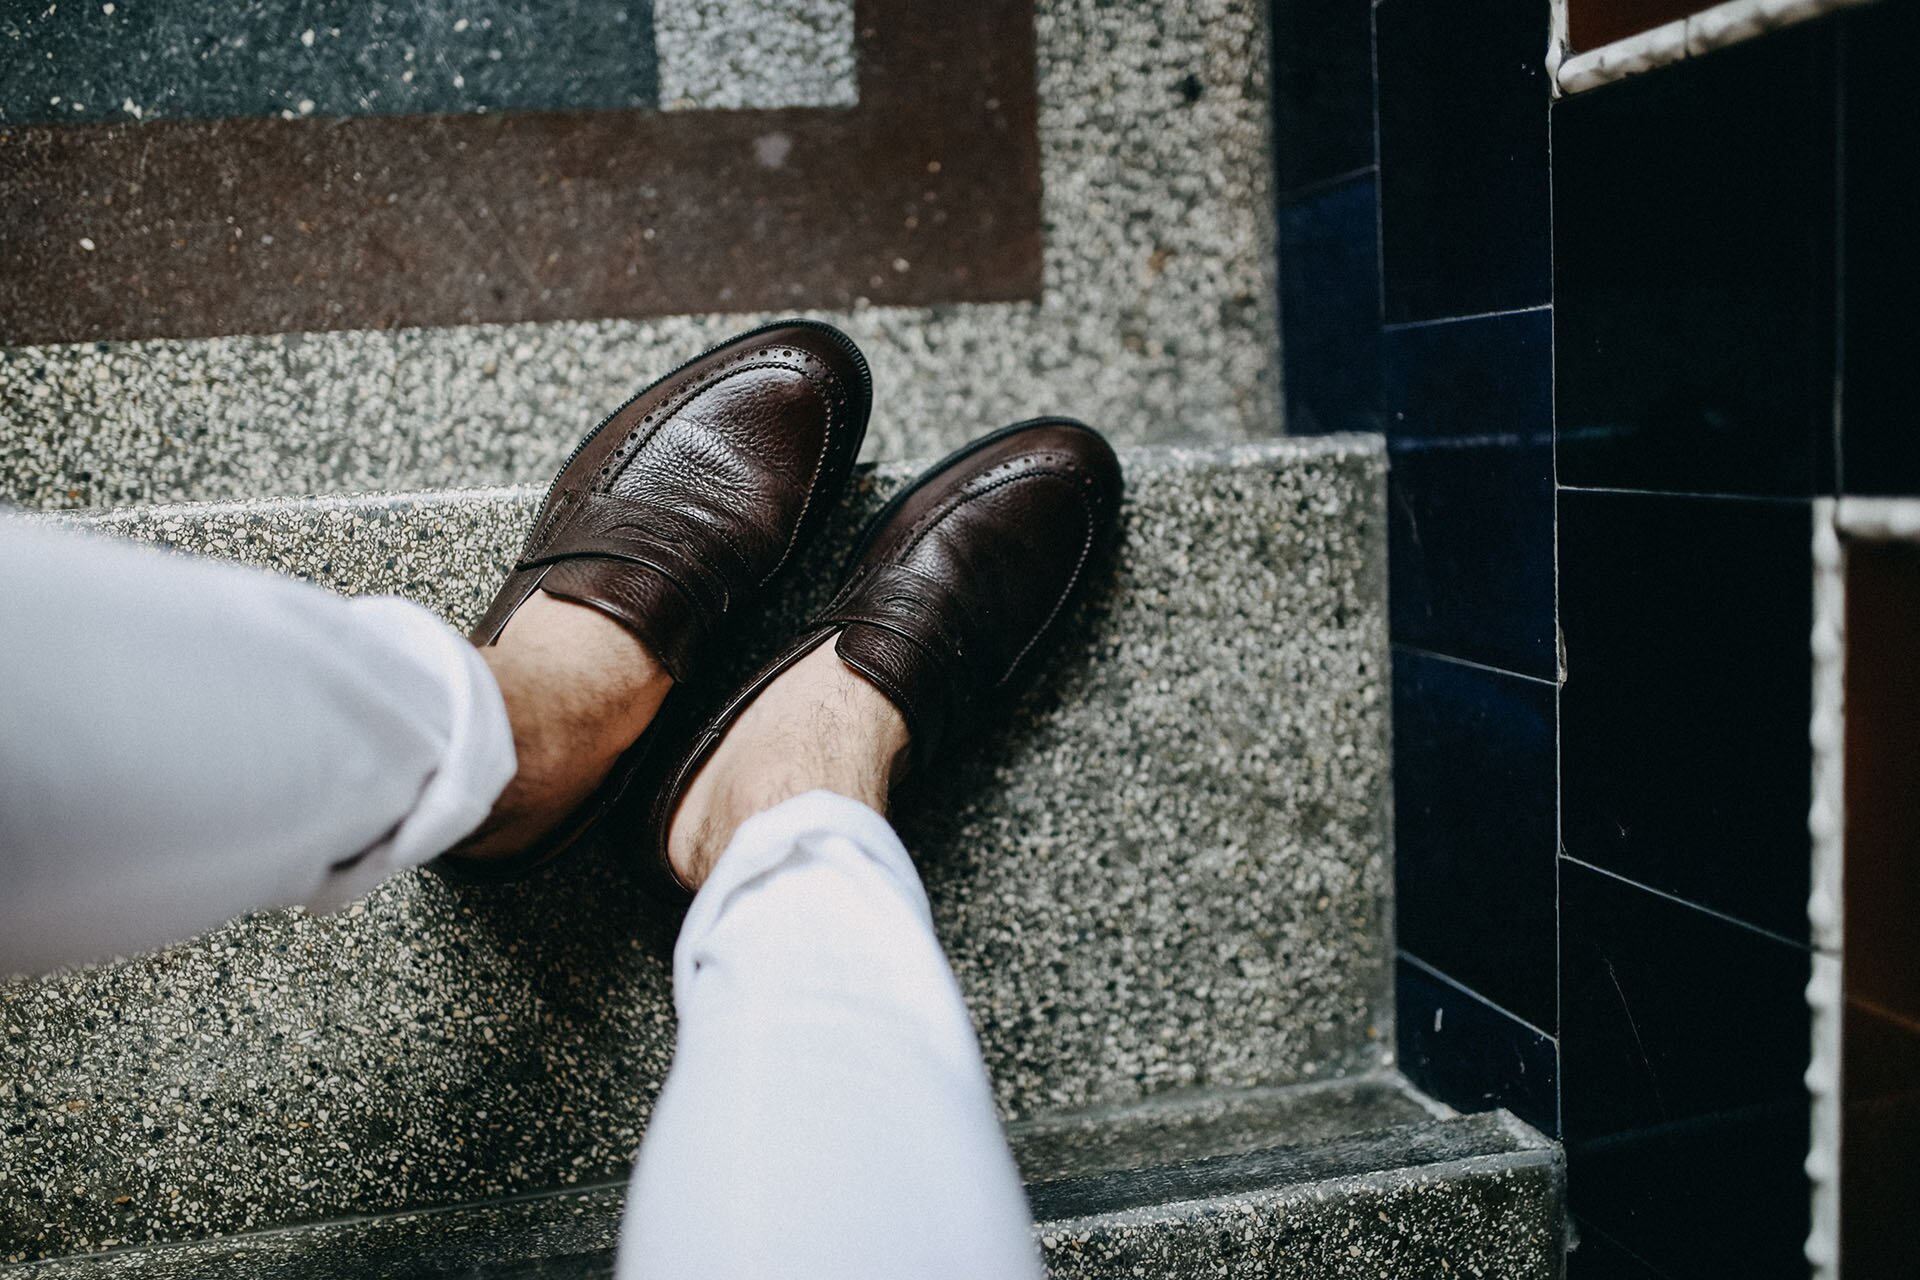 Penny loafers, Mokasyny męskie, Mokasyny Massimo Dutti, Skórzane penny loafers, Moda męska